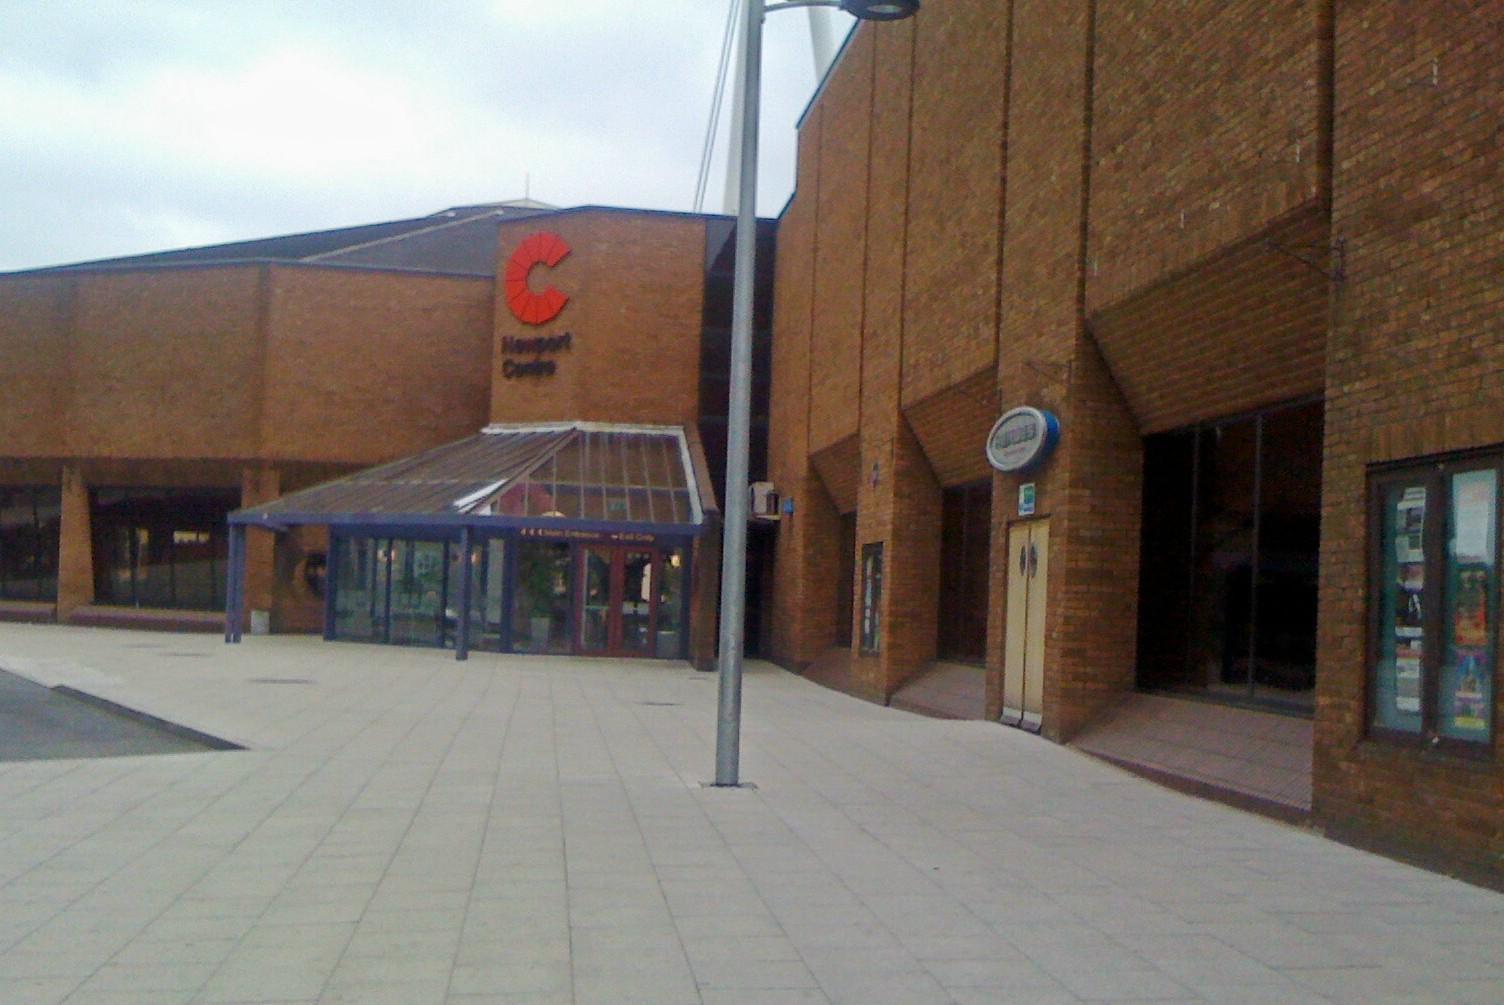 Newport Centre